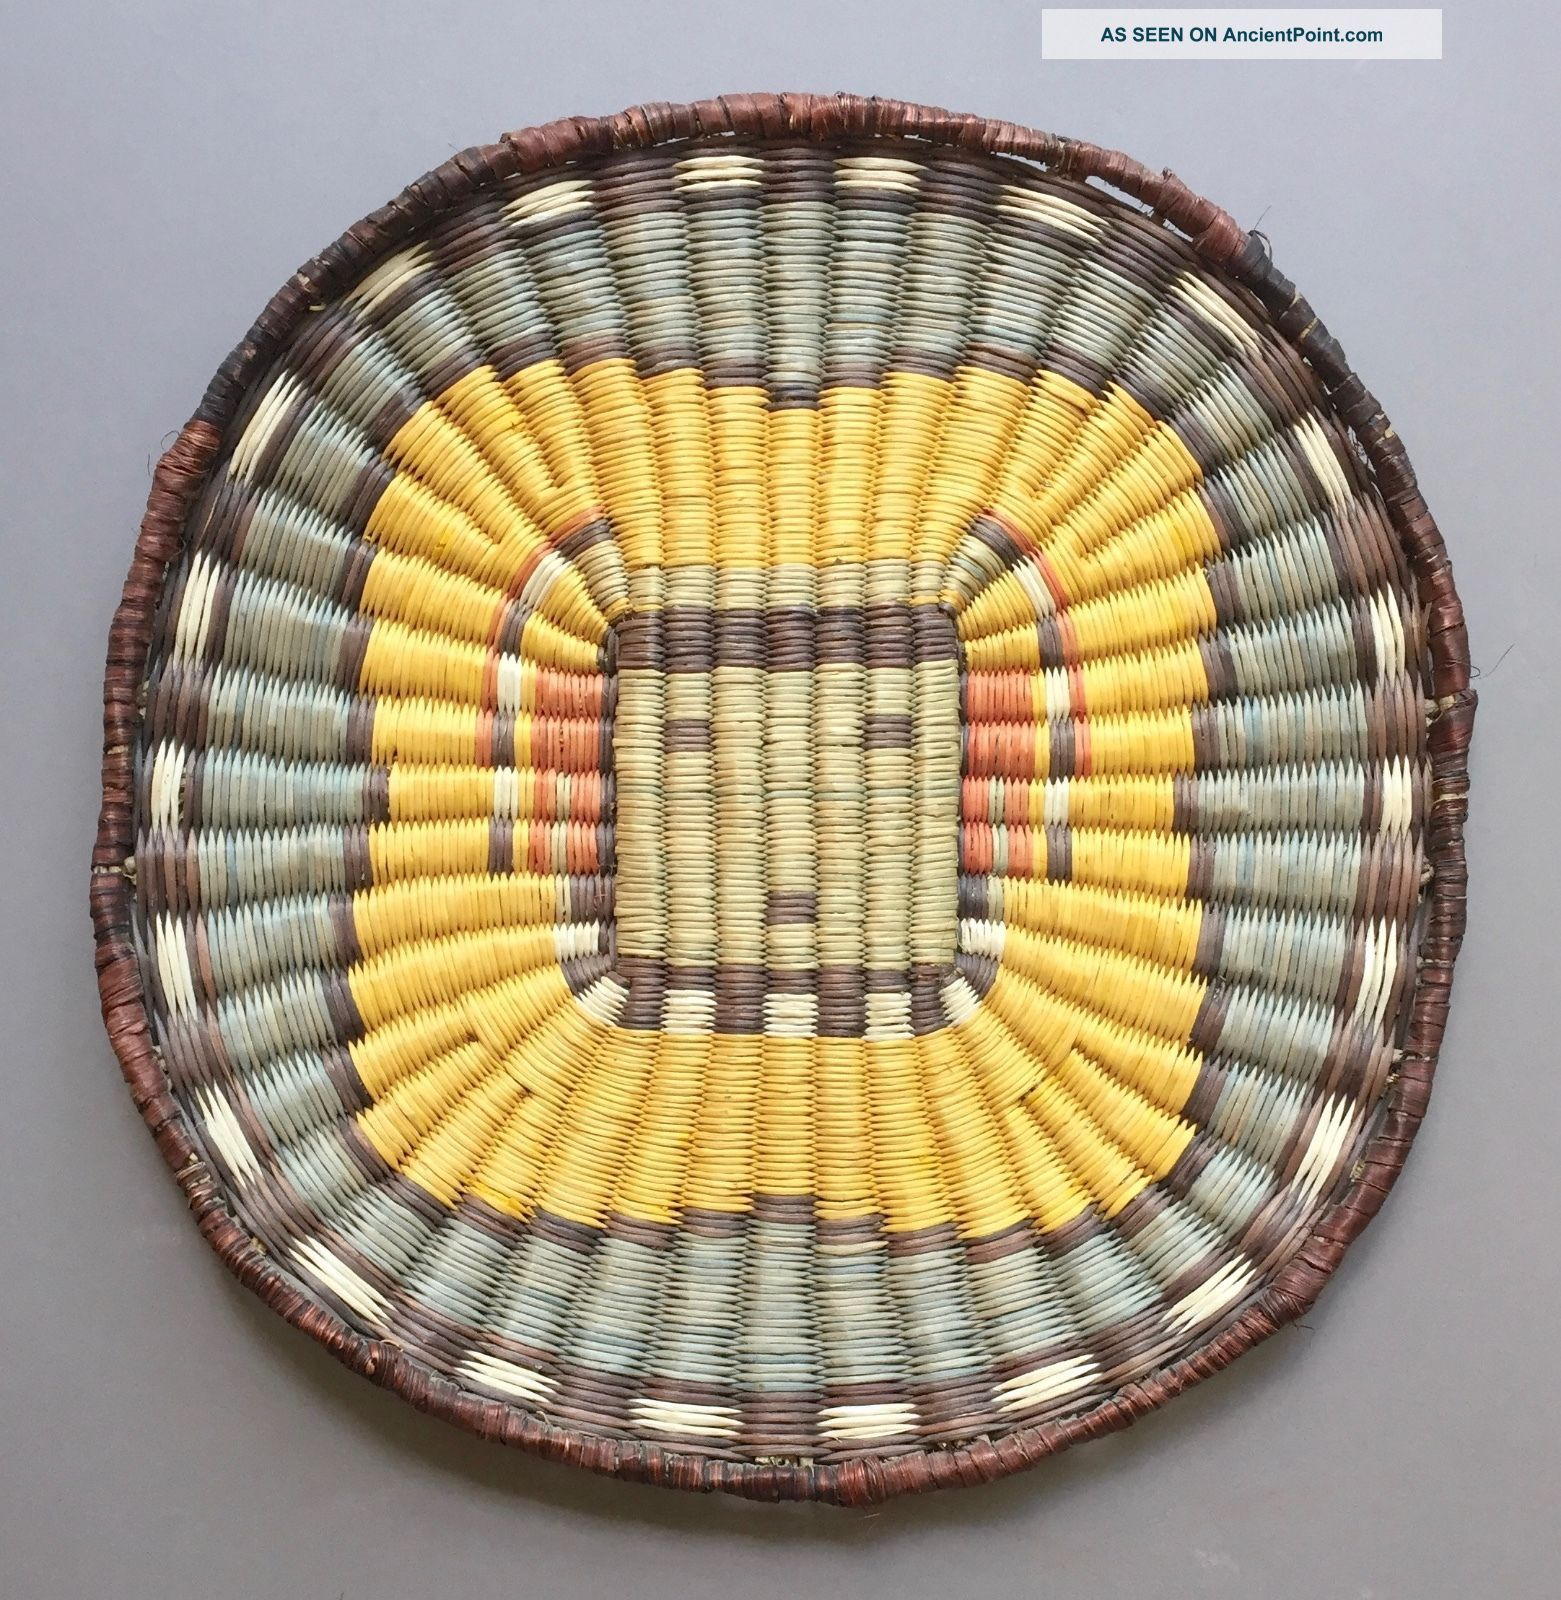 Hopi Wicker Basket Plaque - Kachina Design Native American photo